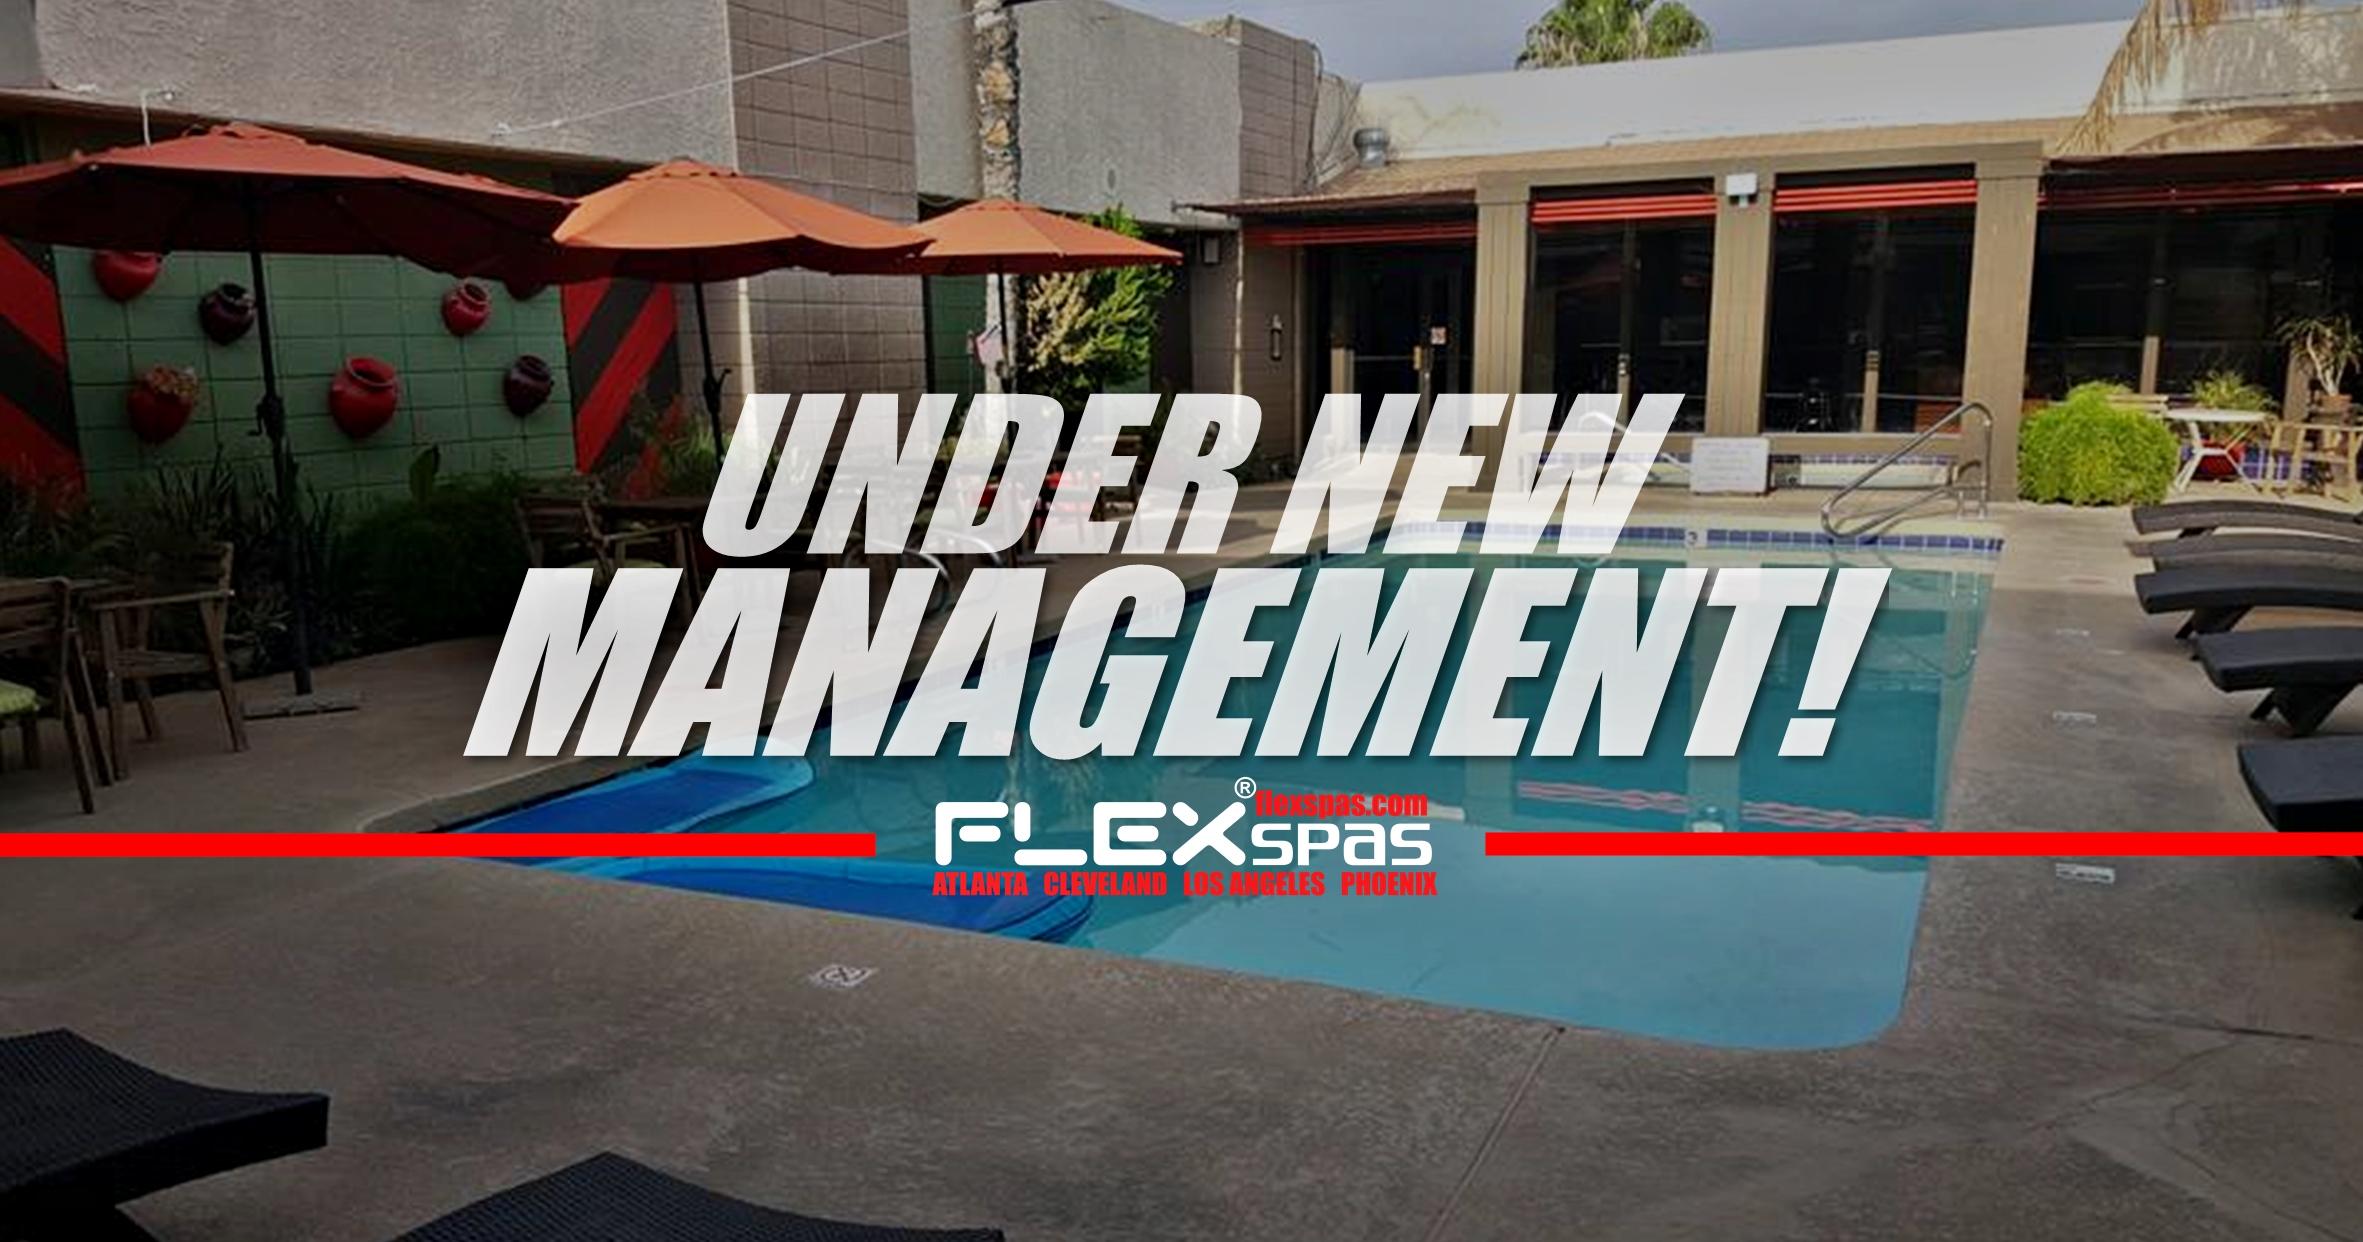 PHX MANAGEMENT